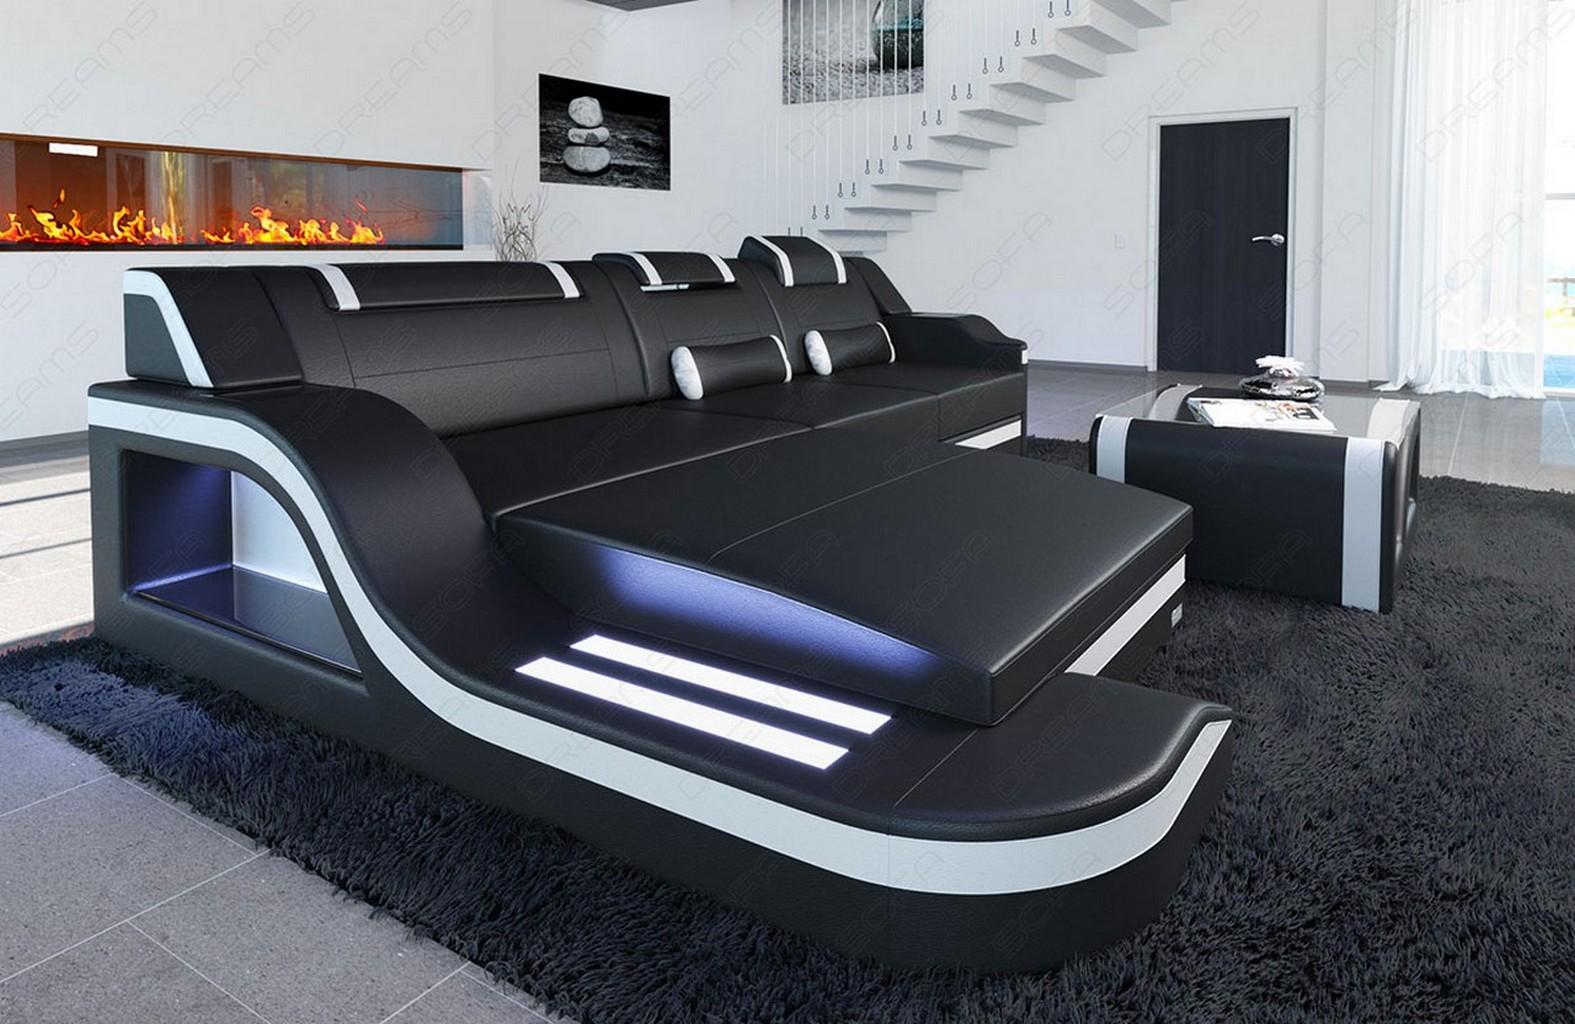 ledercouch palermo l form led designersofa eckcouch design bigsofa. Black Bedroom Furniture Sets. Home Design Ideas